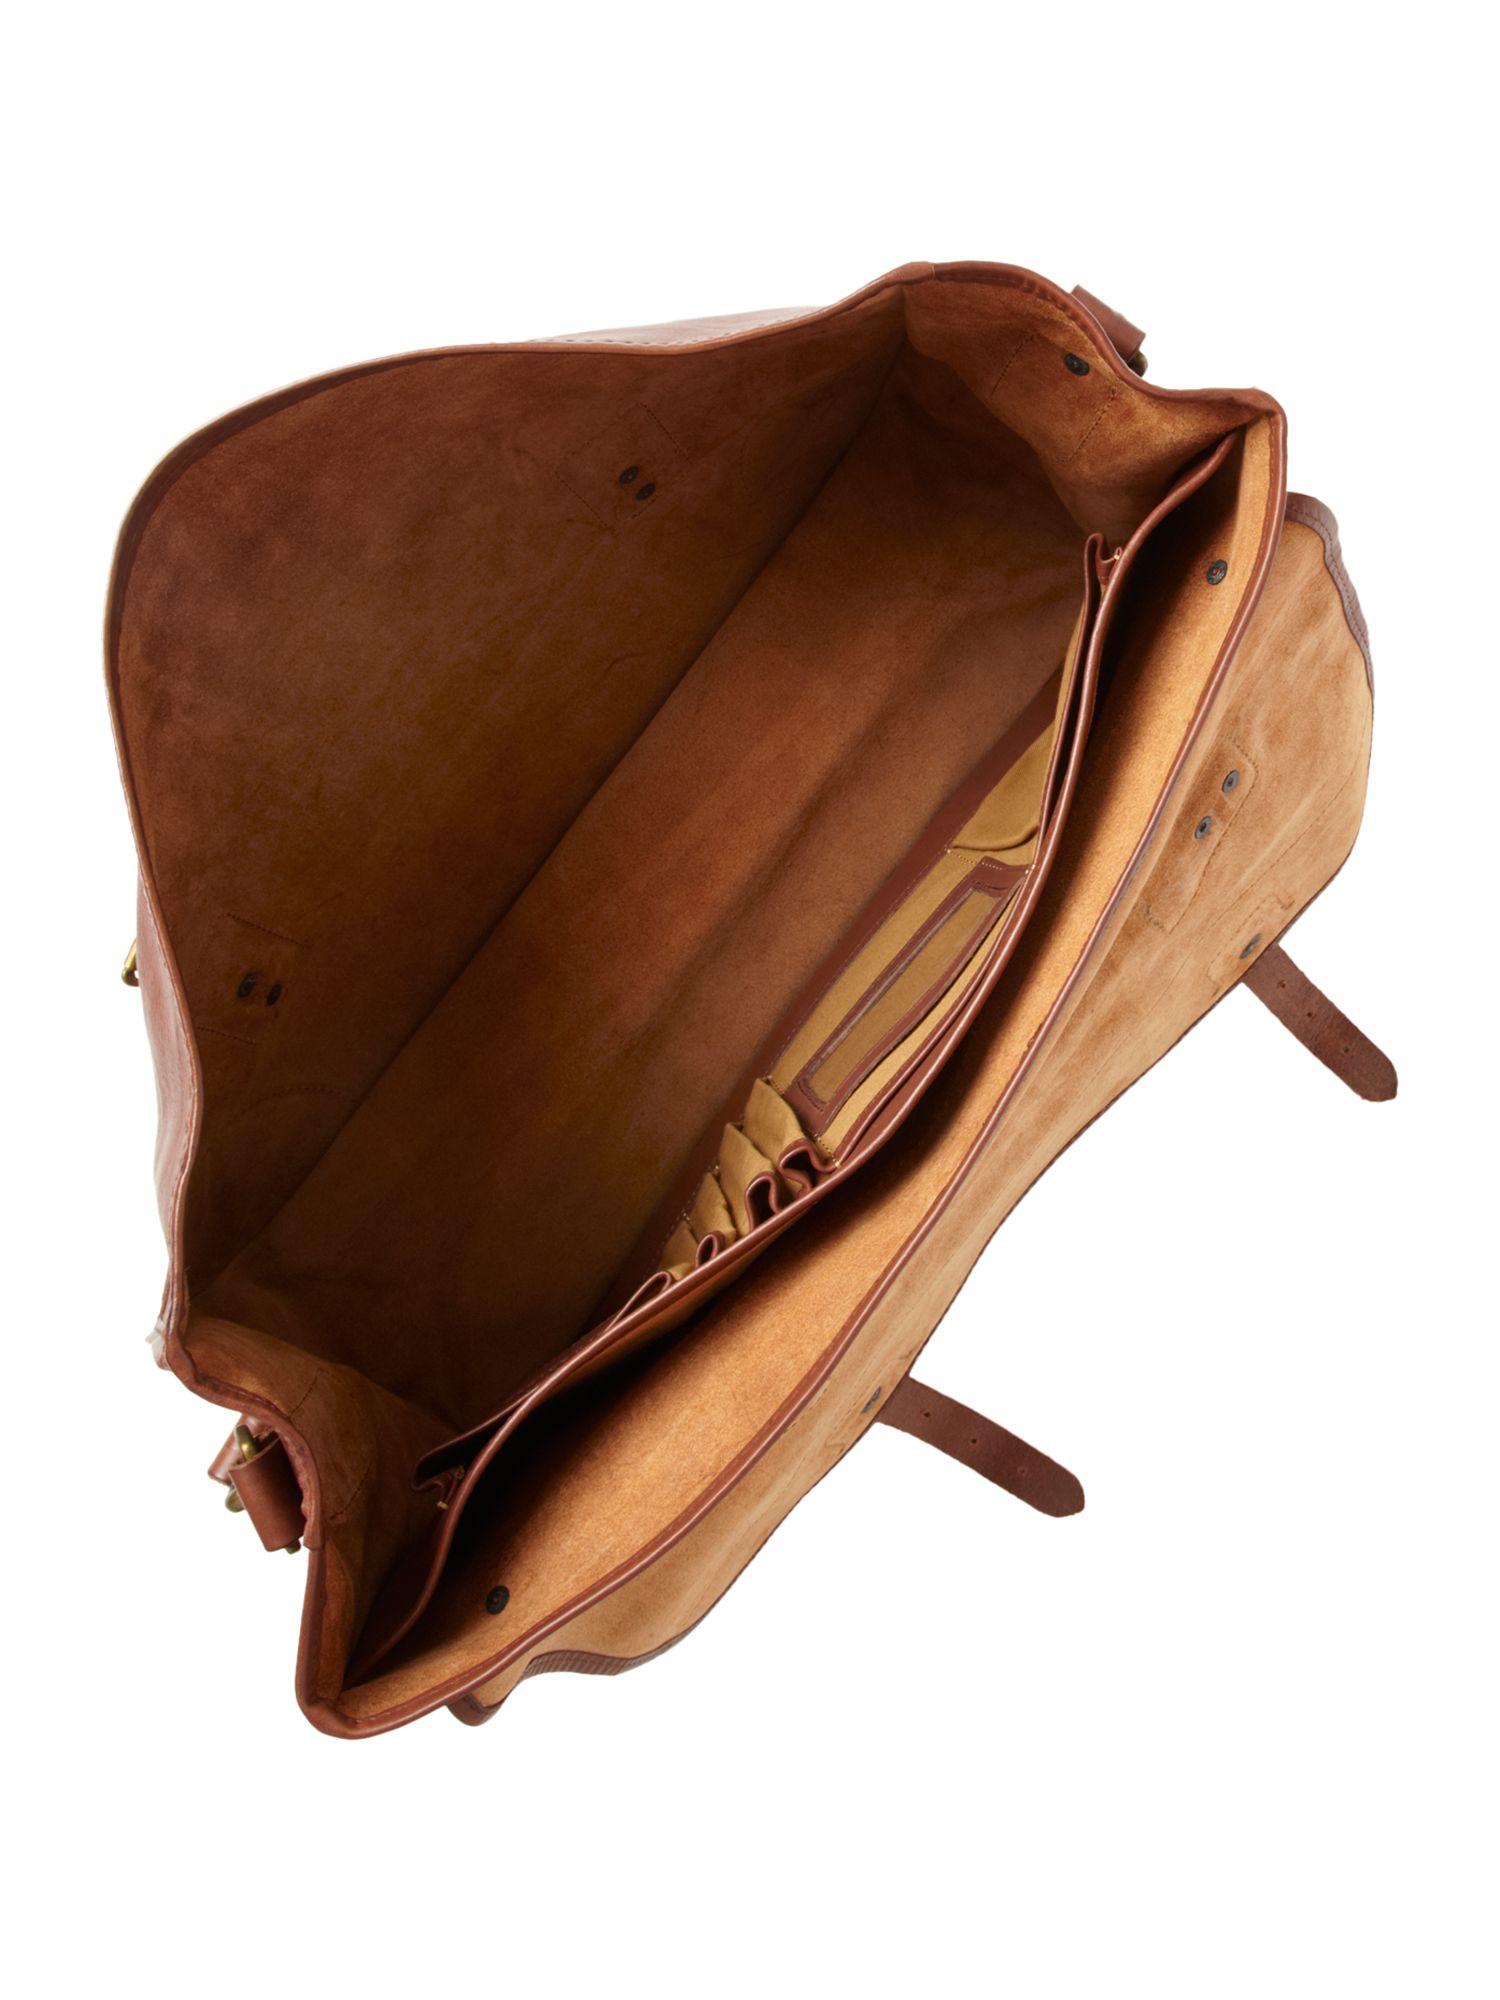 ralph lauren tan leather purse polo ralph lauren white polo